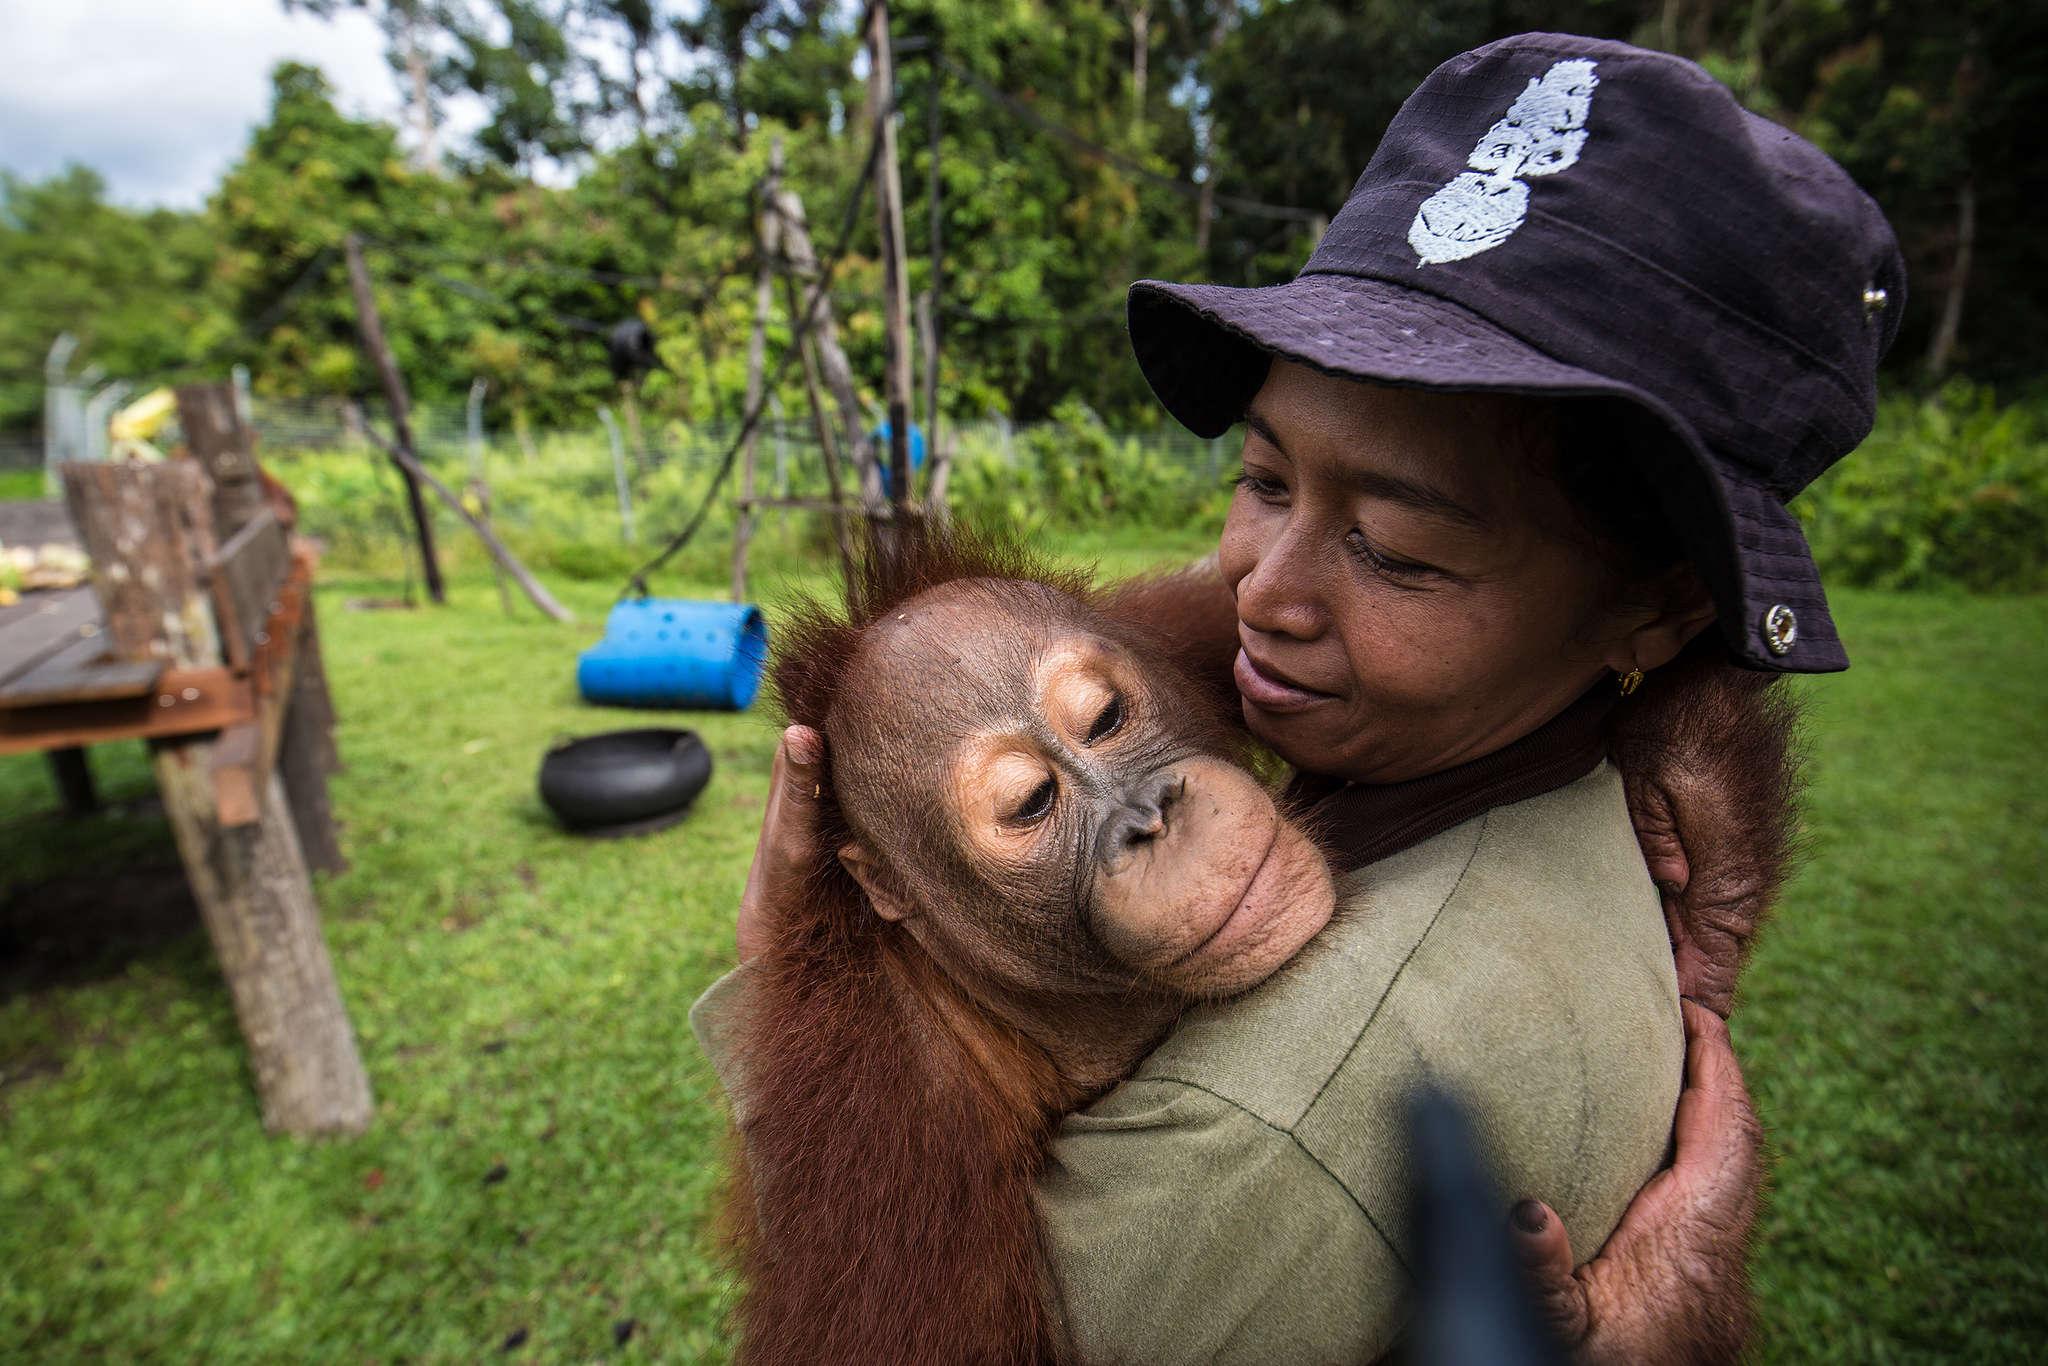 Orangutan at BOS Nyaru Menteng Orangutan Rescue Center, Indonesia © Bjorn Vaugn / BOSF / Greenpeace